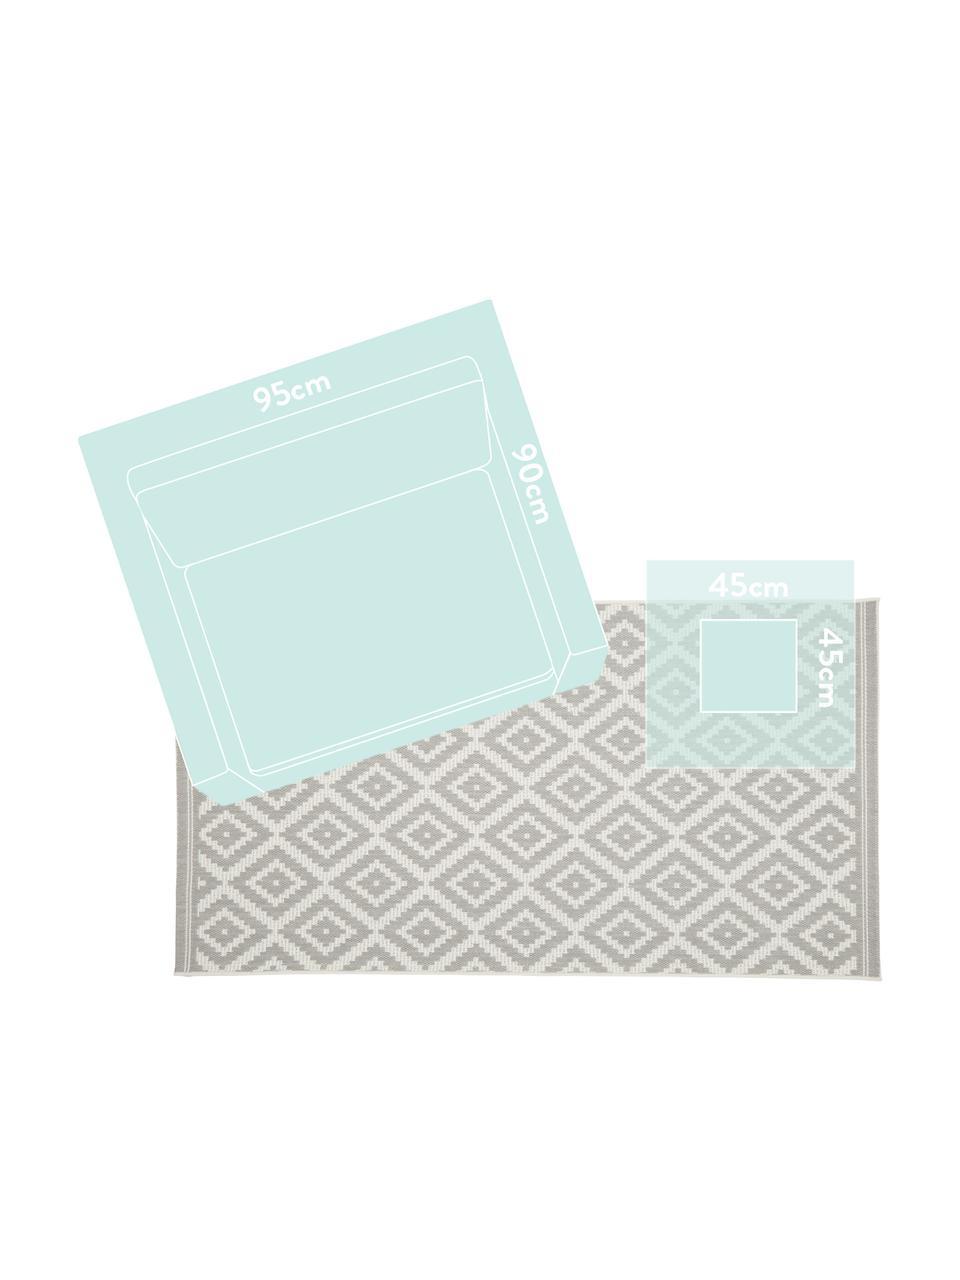 Alfombra de interior/exterior Miami, 86%polipropileno, 14%poliéster, Blanco crema, gris, An 200 x L 290 cm (Tamaño L)